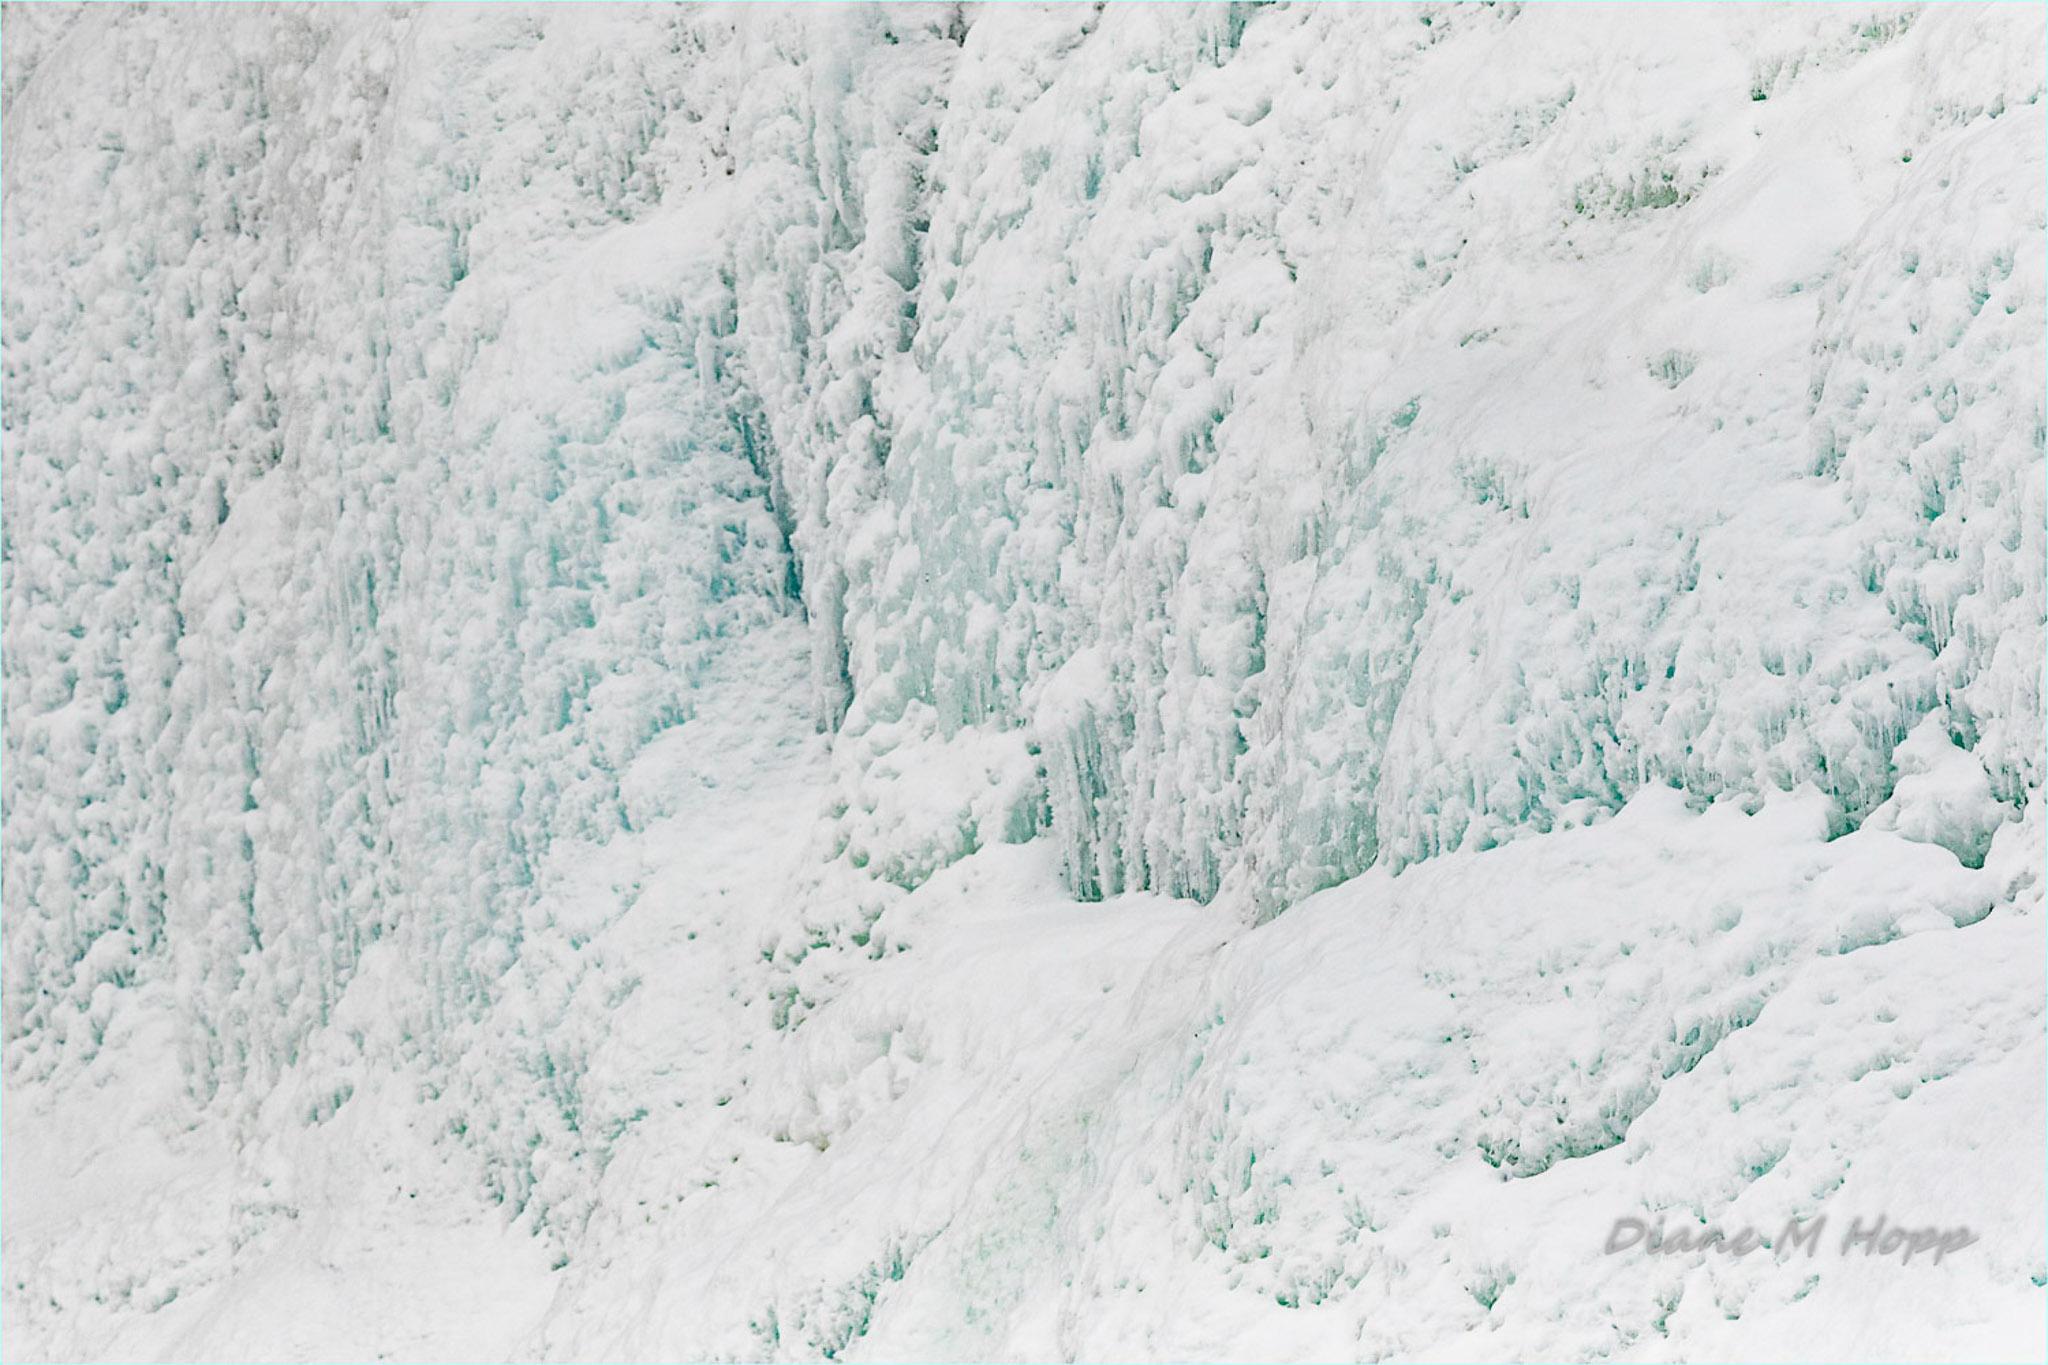 Diane Hopp -Minimalist - Ice Textures